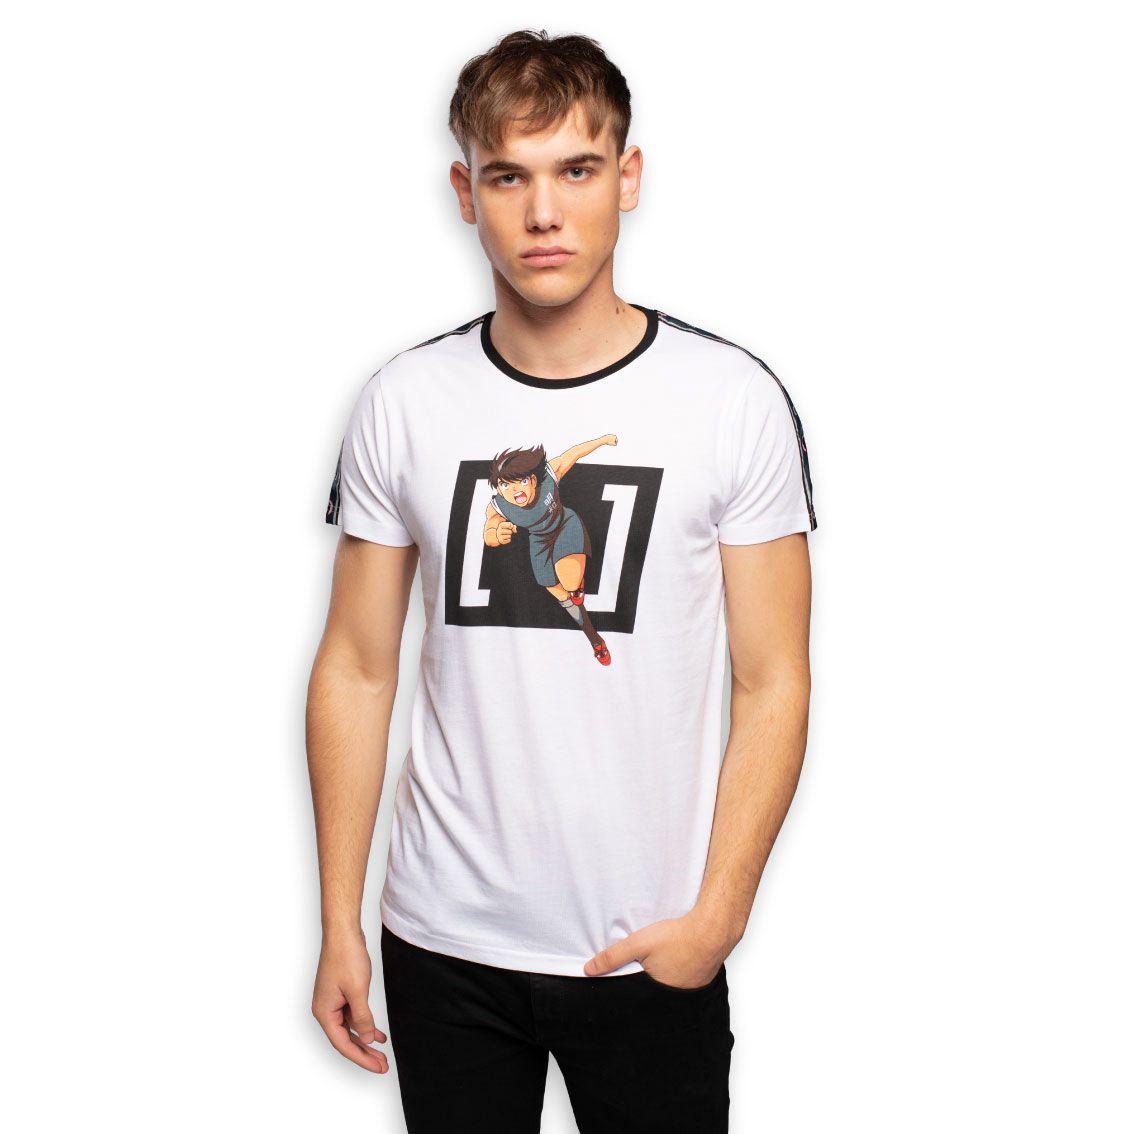 T-shirt homme captain tsubasa kojiro blanc